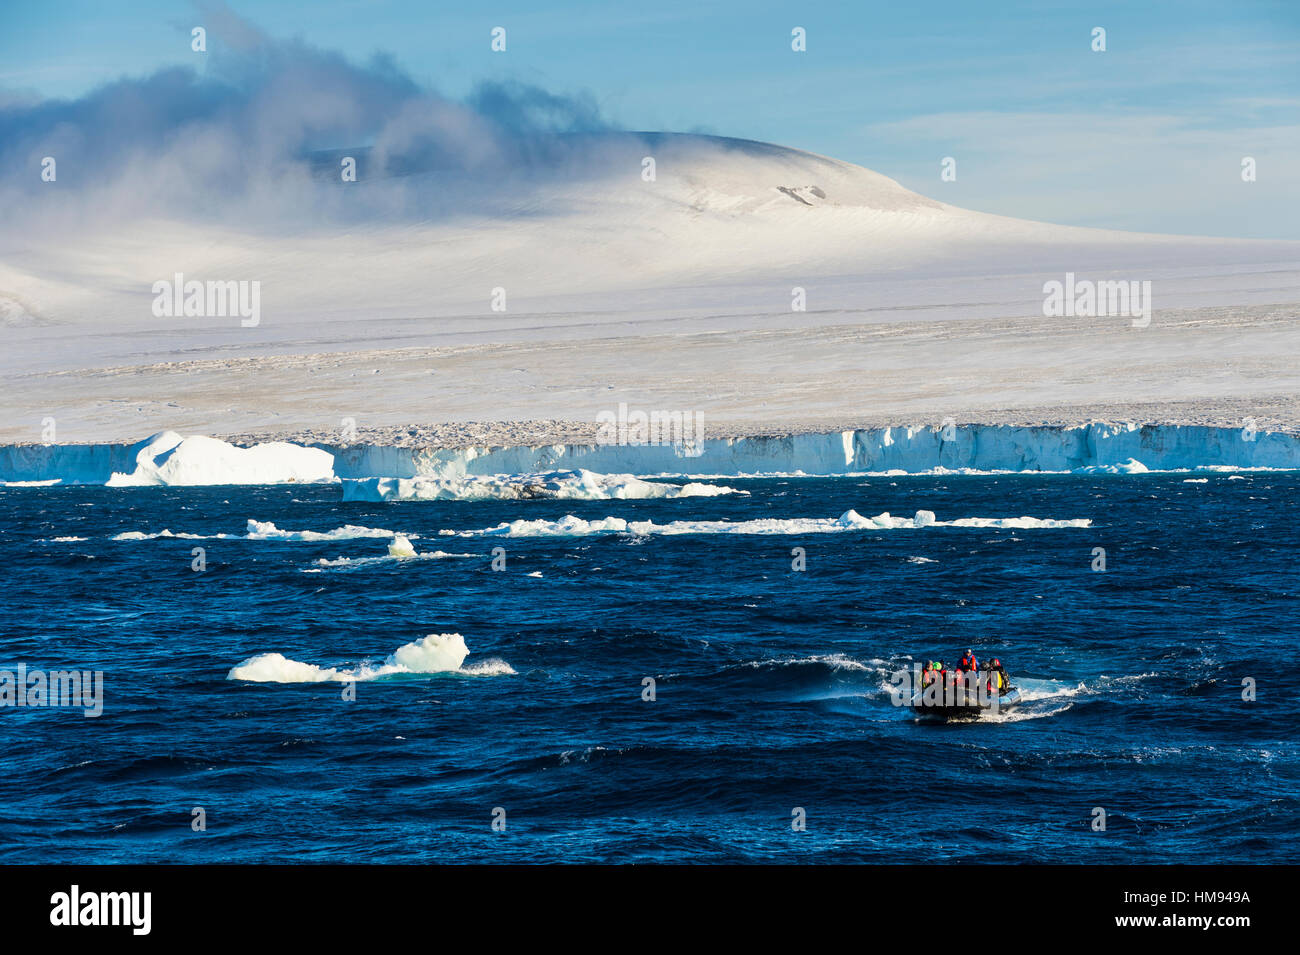 Zodiac with tourists cruising through the icebergs, Brown Bluff, Tabarin Peninsula, Antarctica, Polar Regions Stock Photo